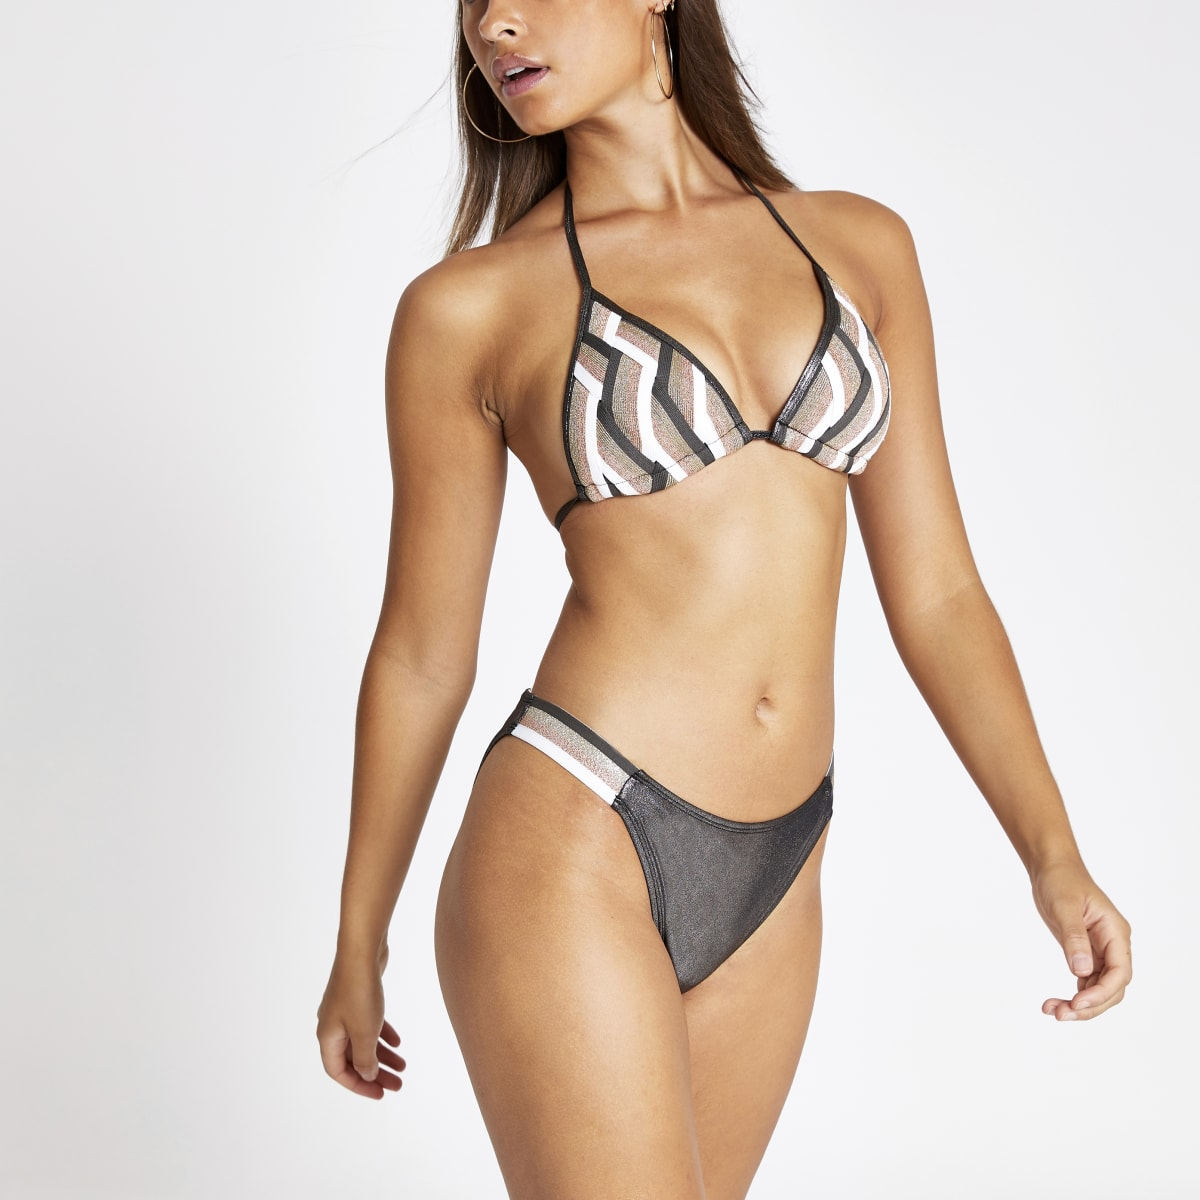 Bas de bikini élastique rose imprimé zigzags